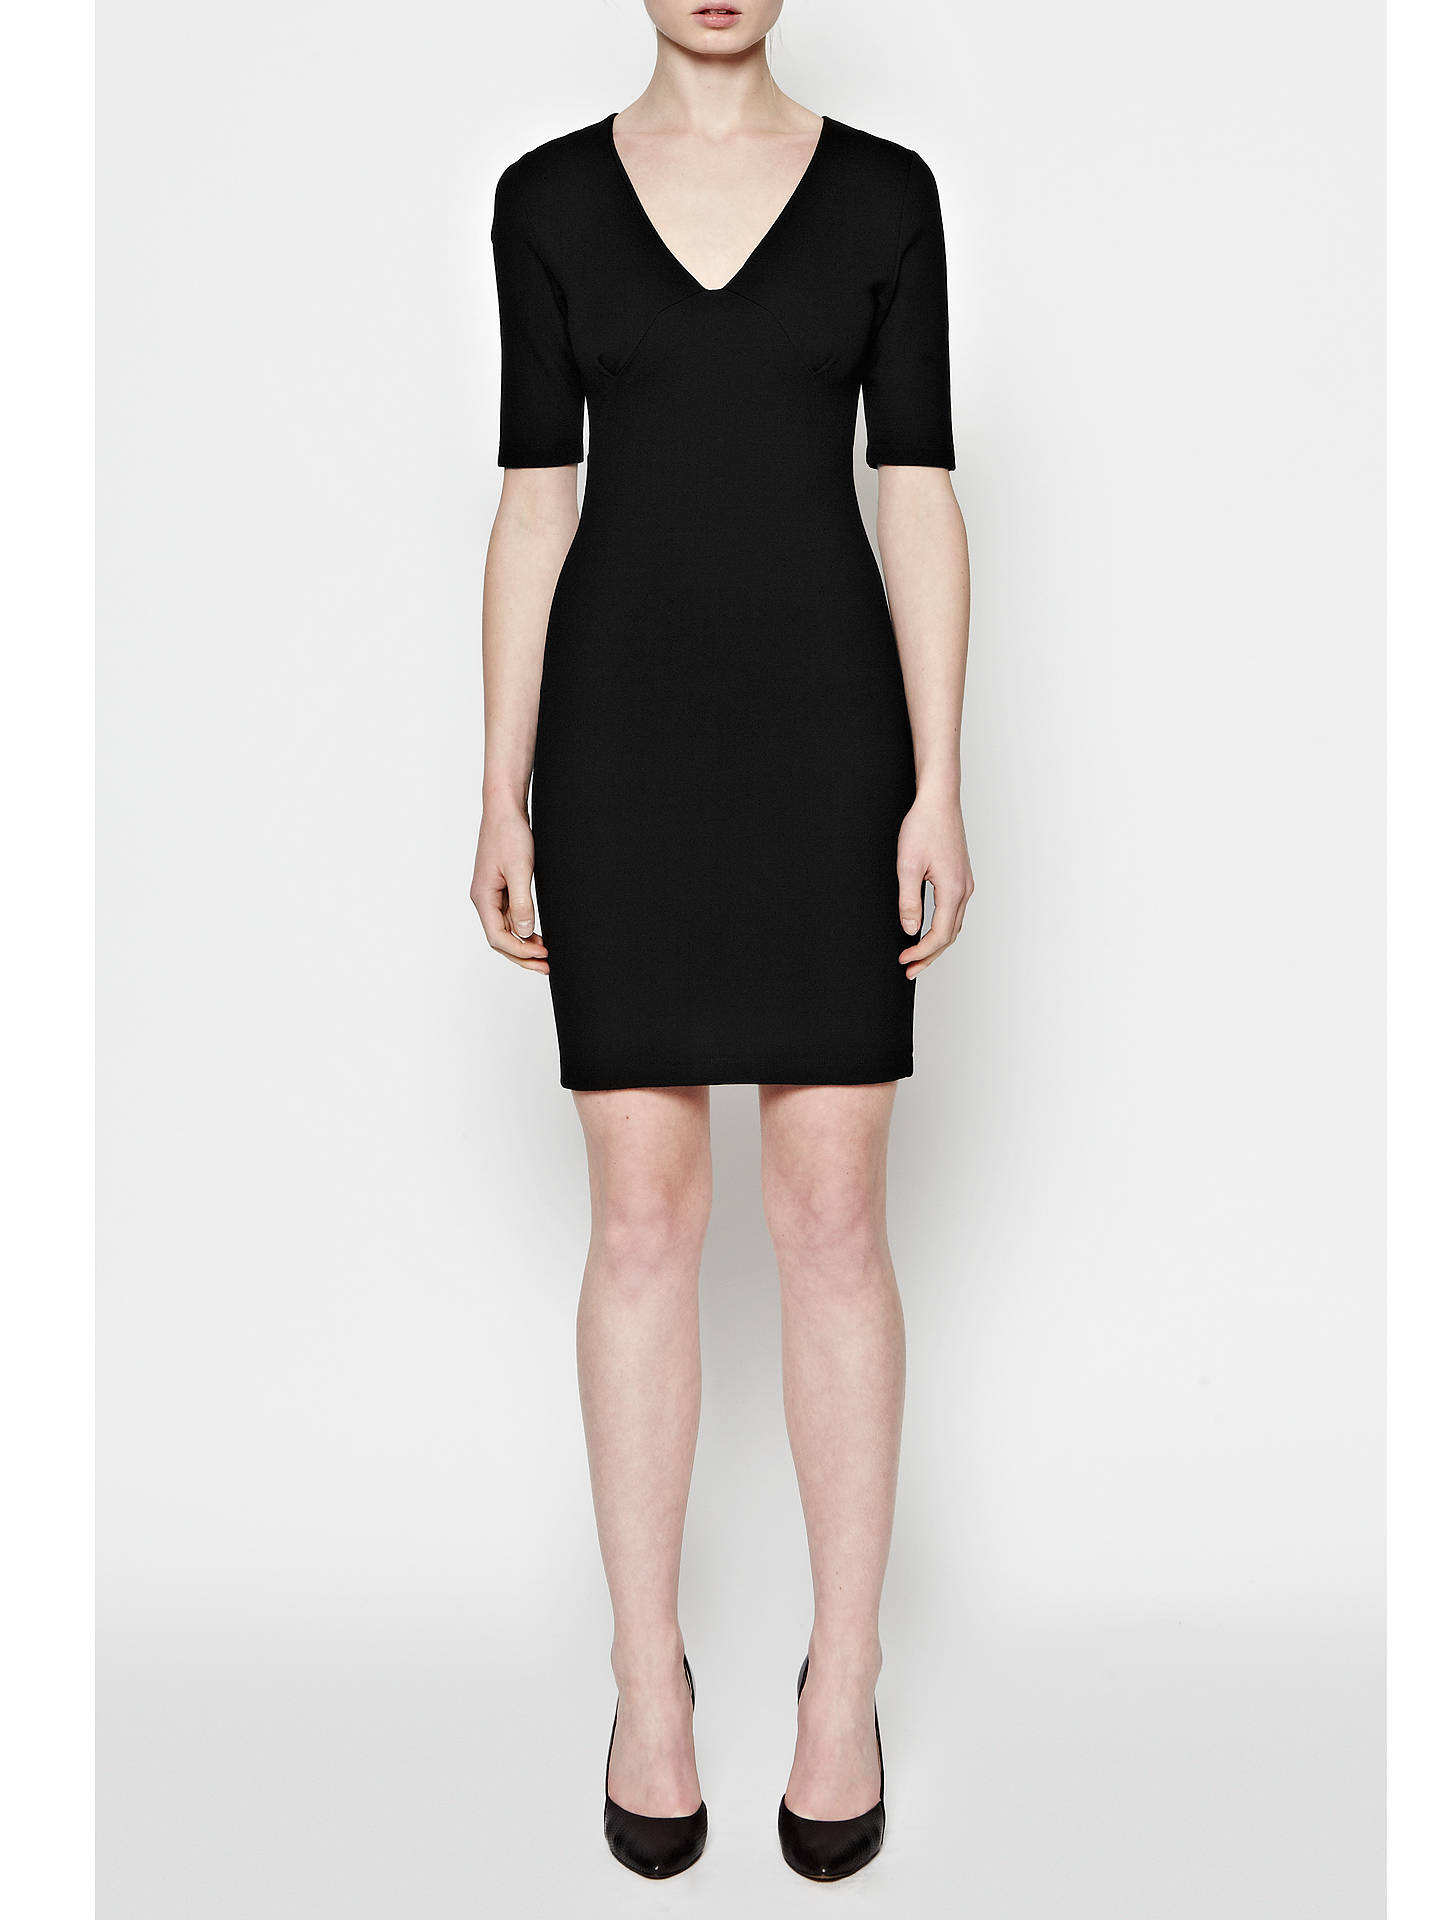 272c7f846cf ... Buy French Connection Lula Stretch V-Neck Dress